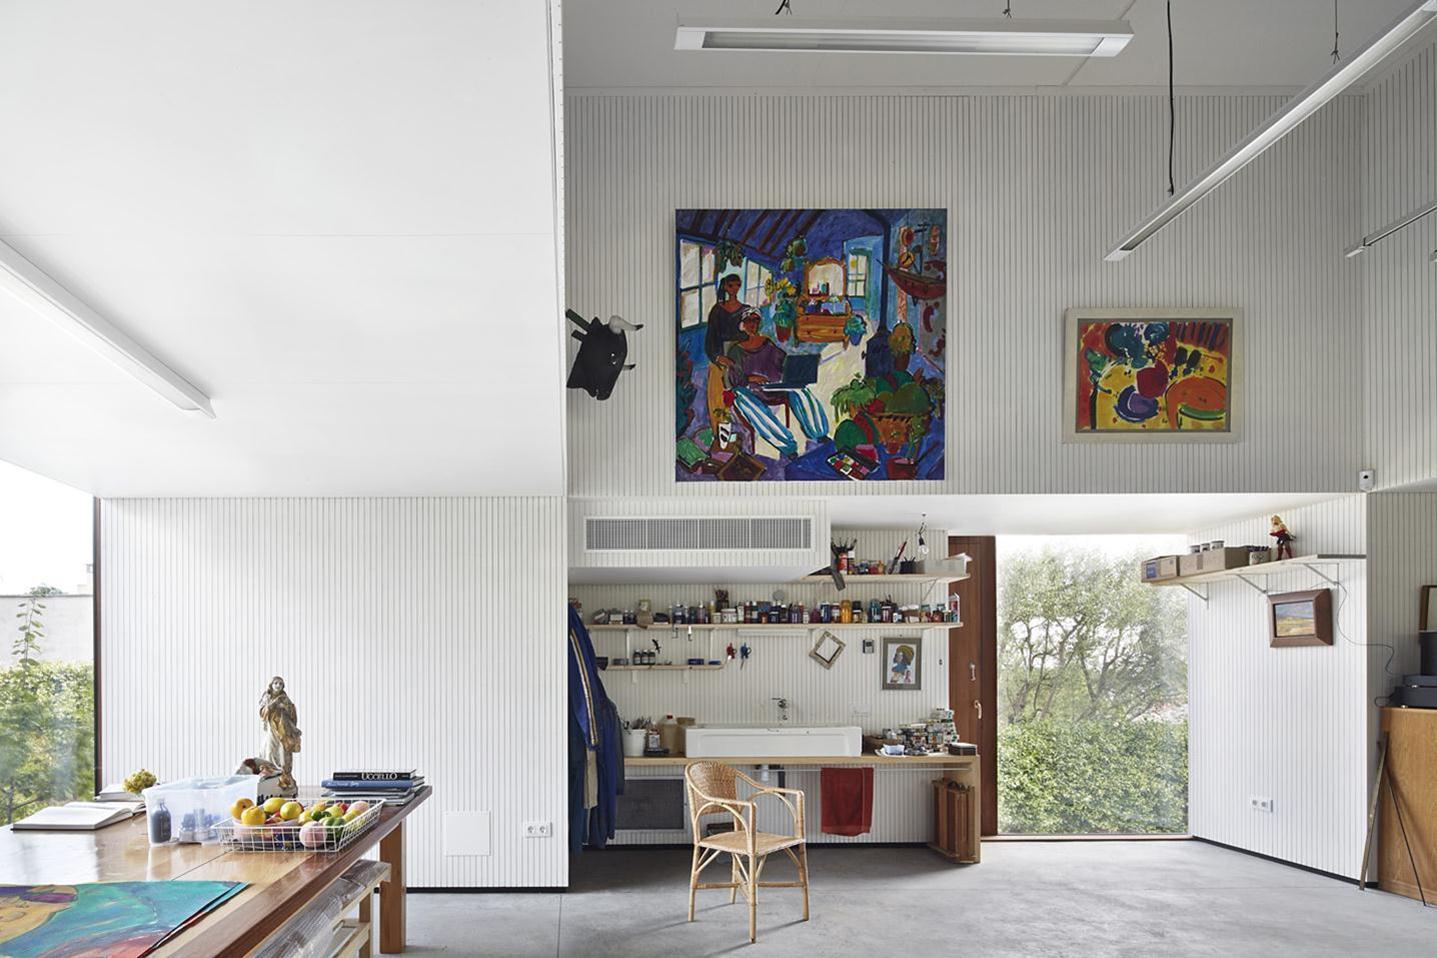 Artist's Studio / Josep Camps - Olga Felip (10)